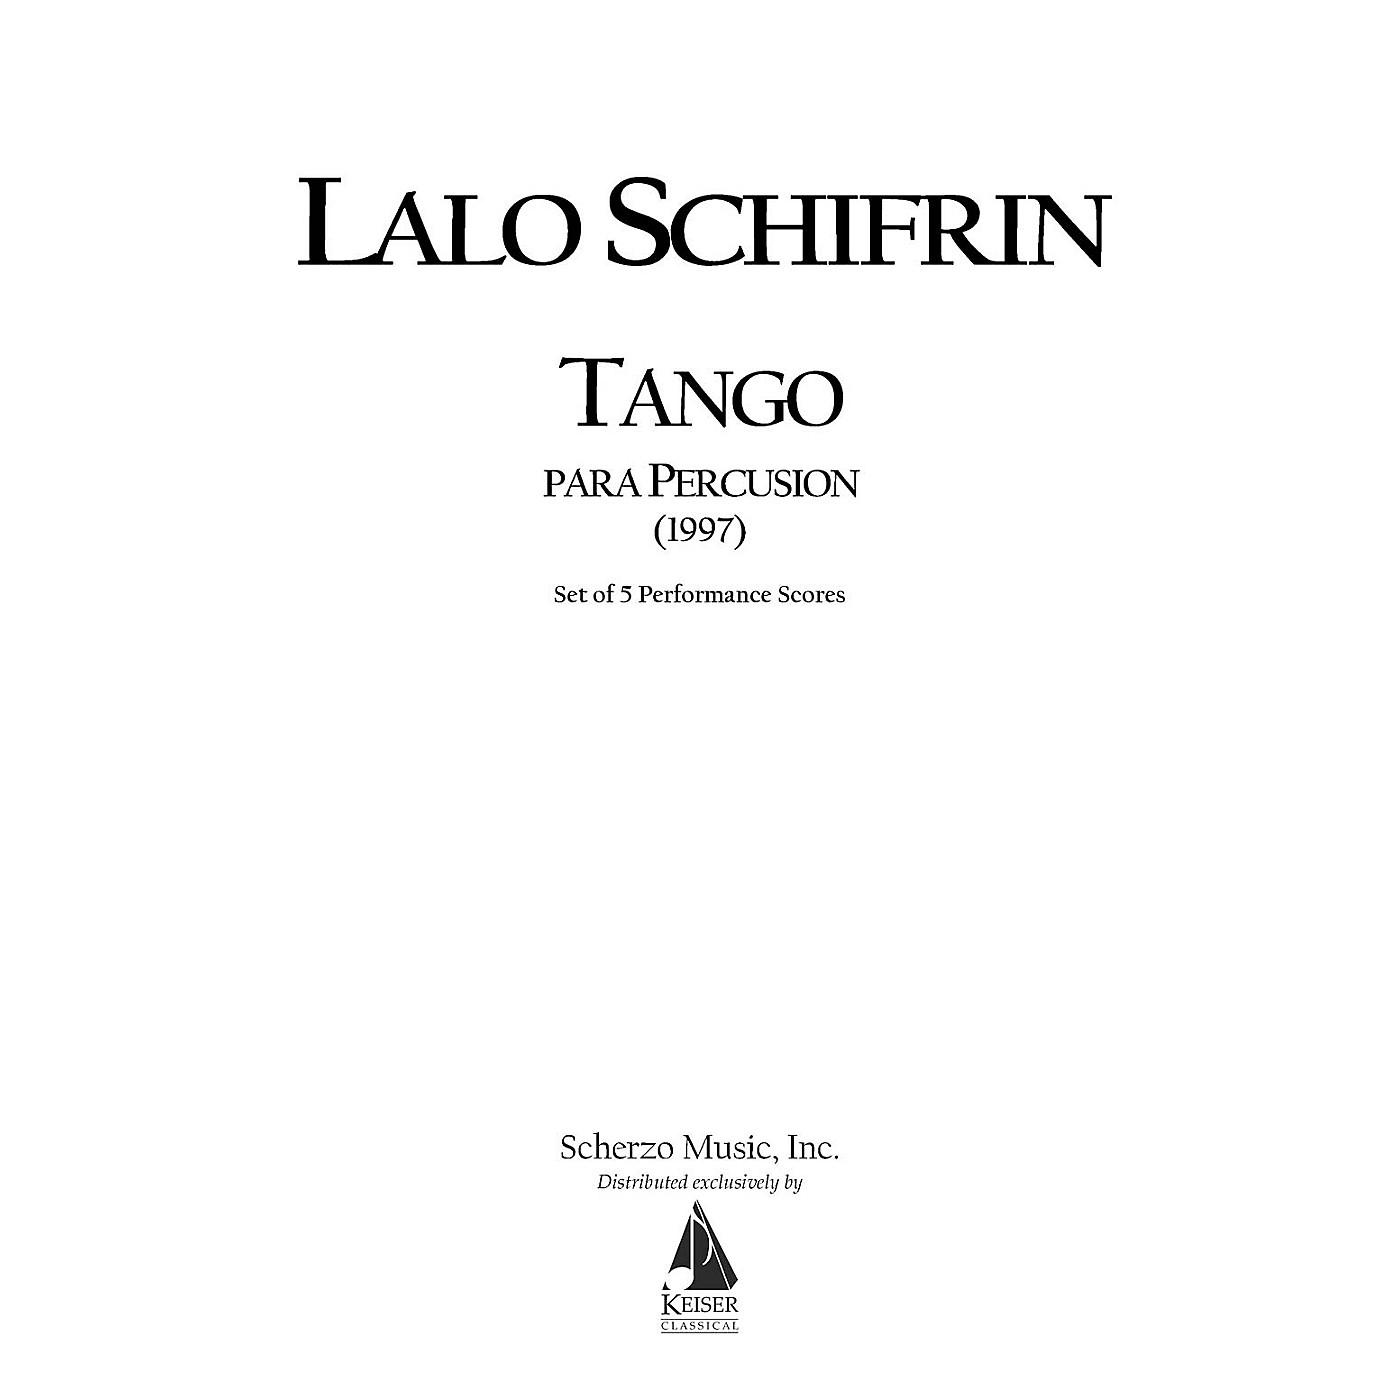 Lauren Keiser Music Publishing Tango Para Percusion (Tango for Percussion) (5 Performance Scores) LKM Music Series by Lalo Schifrin thumbnail